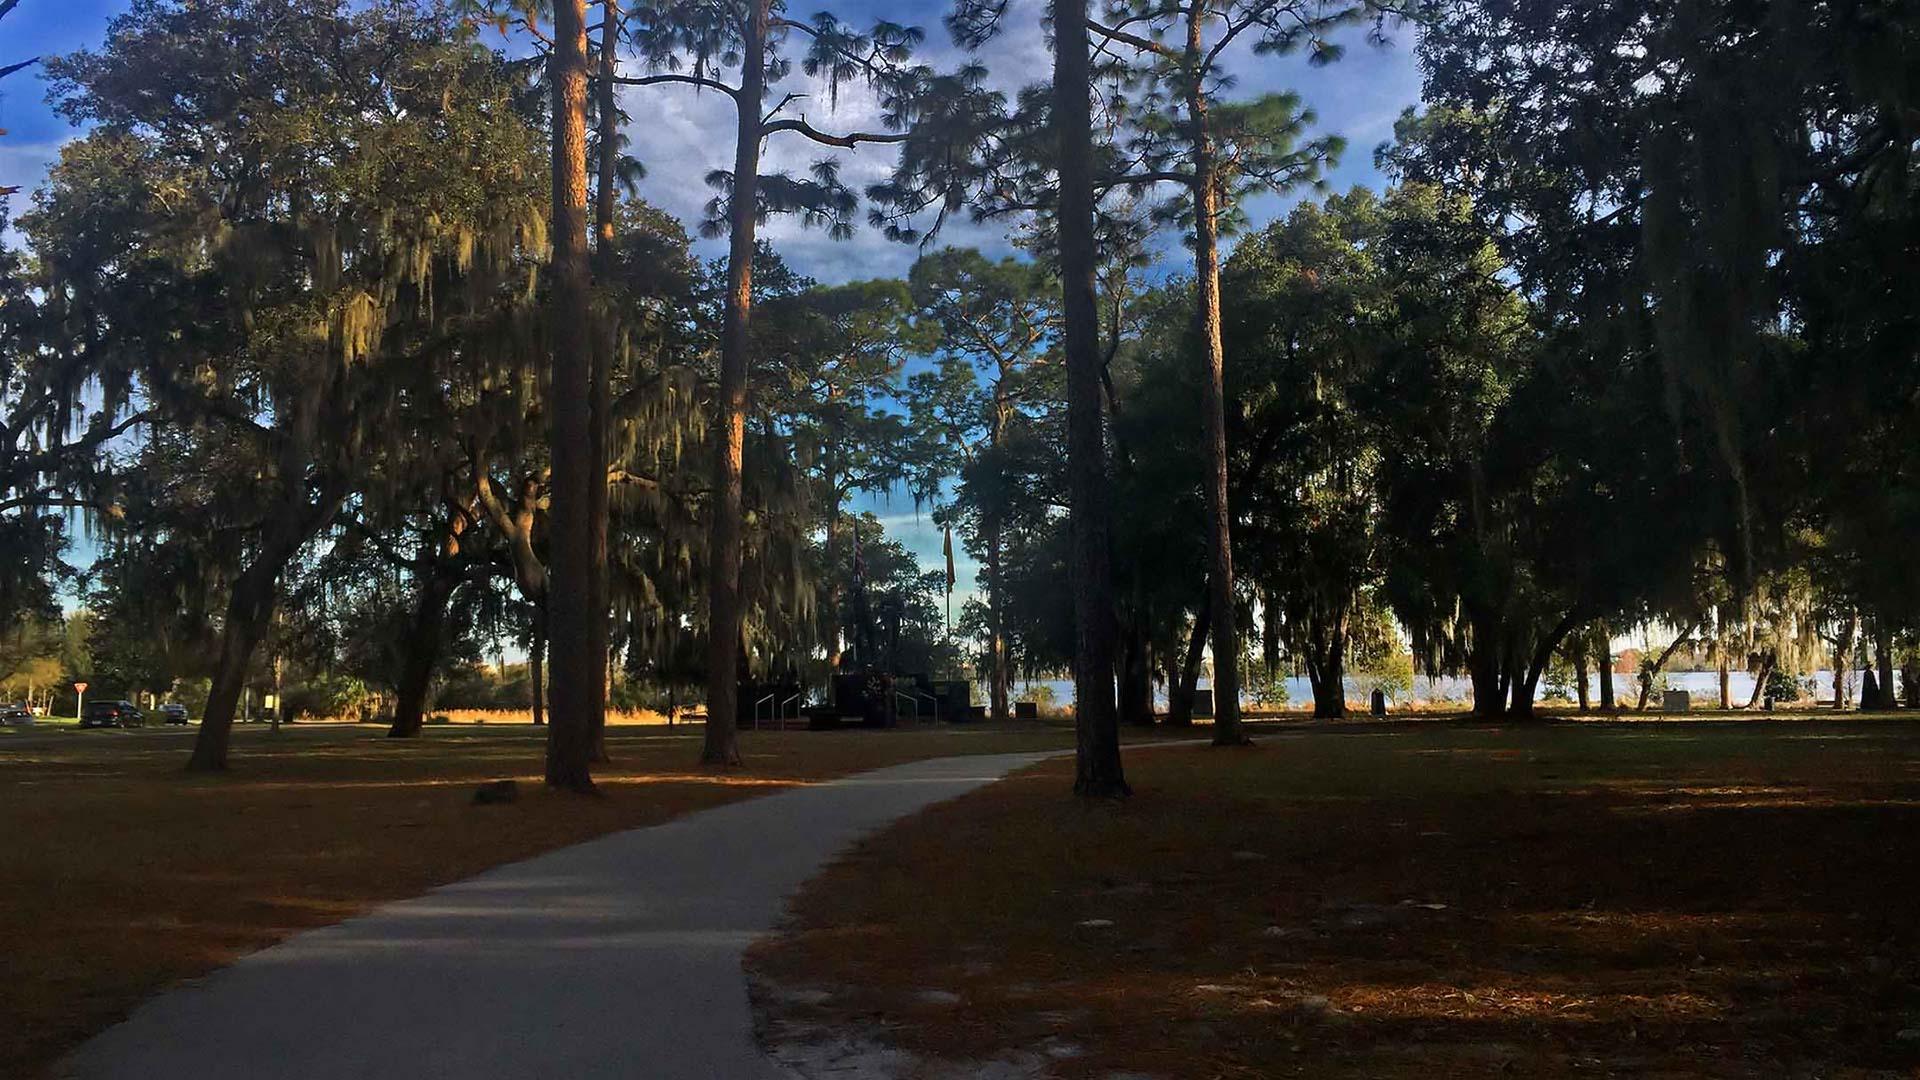 Orlando Veterans Memorial Park